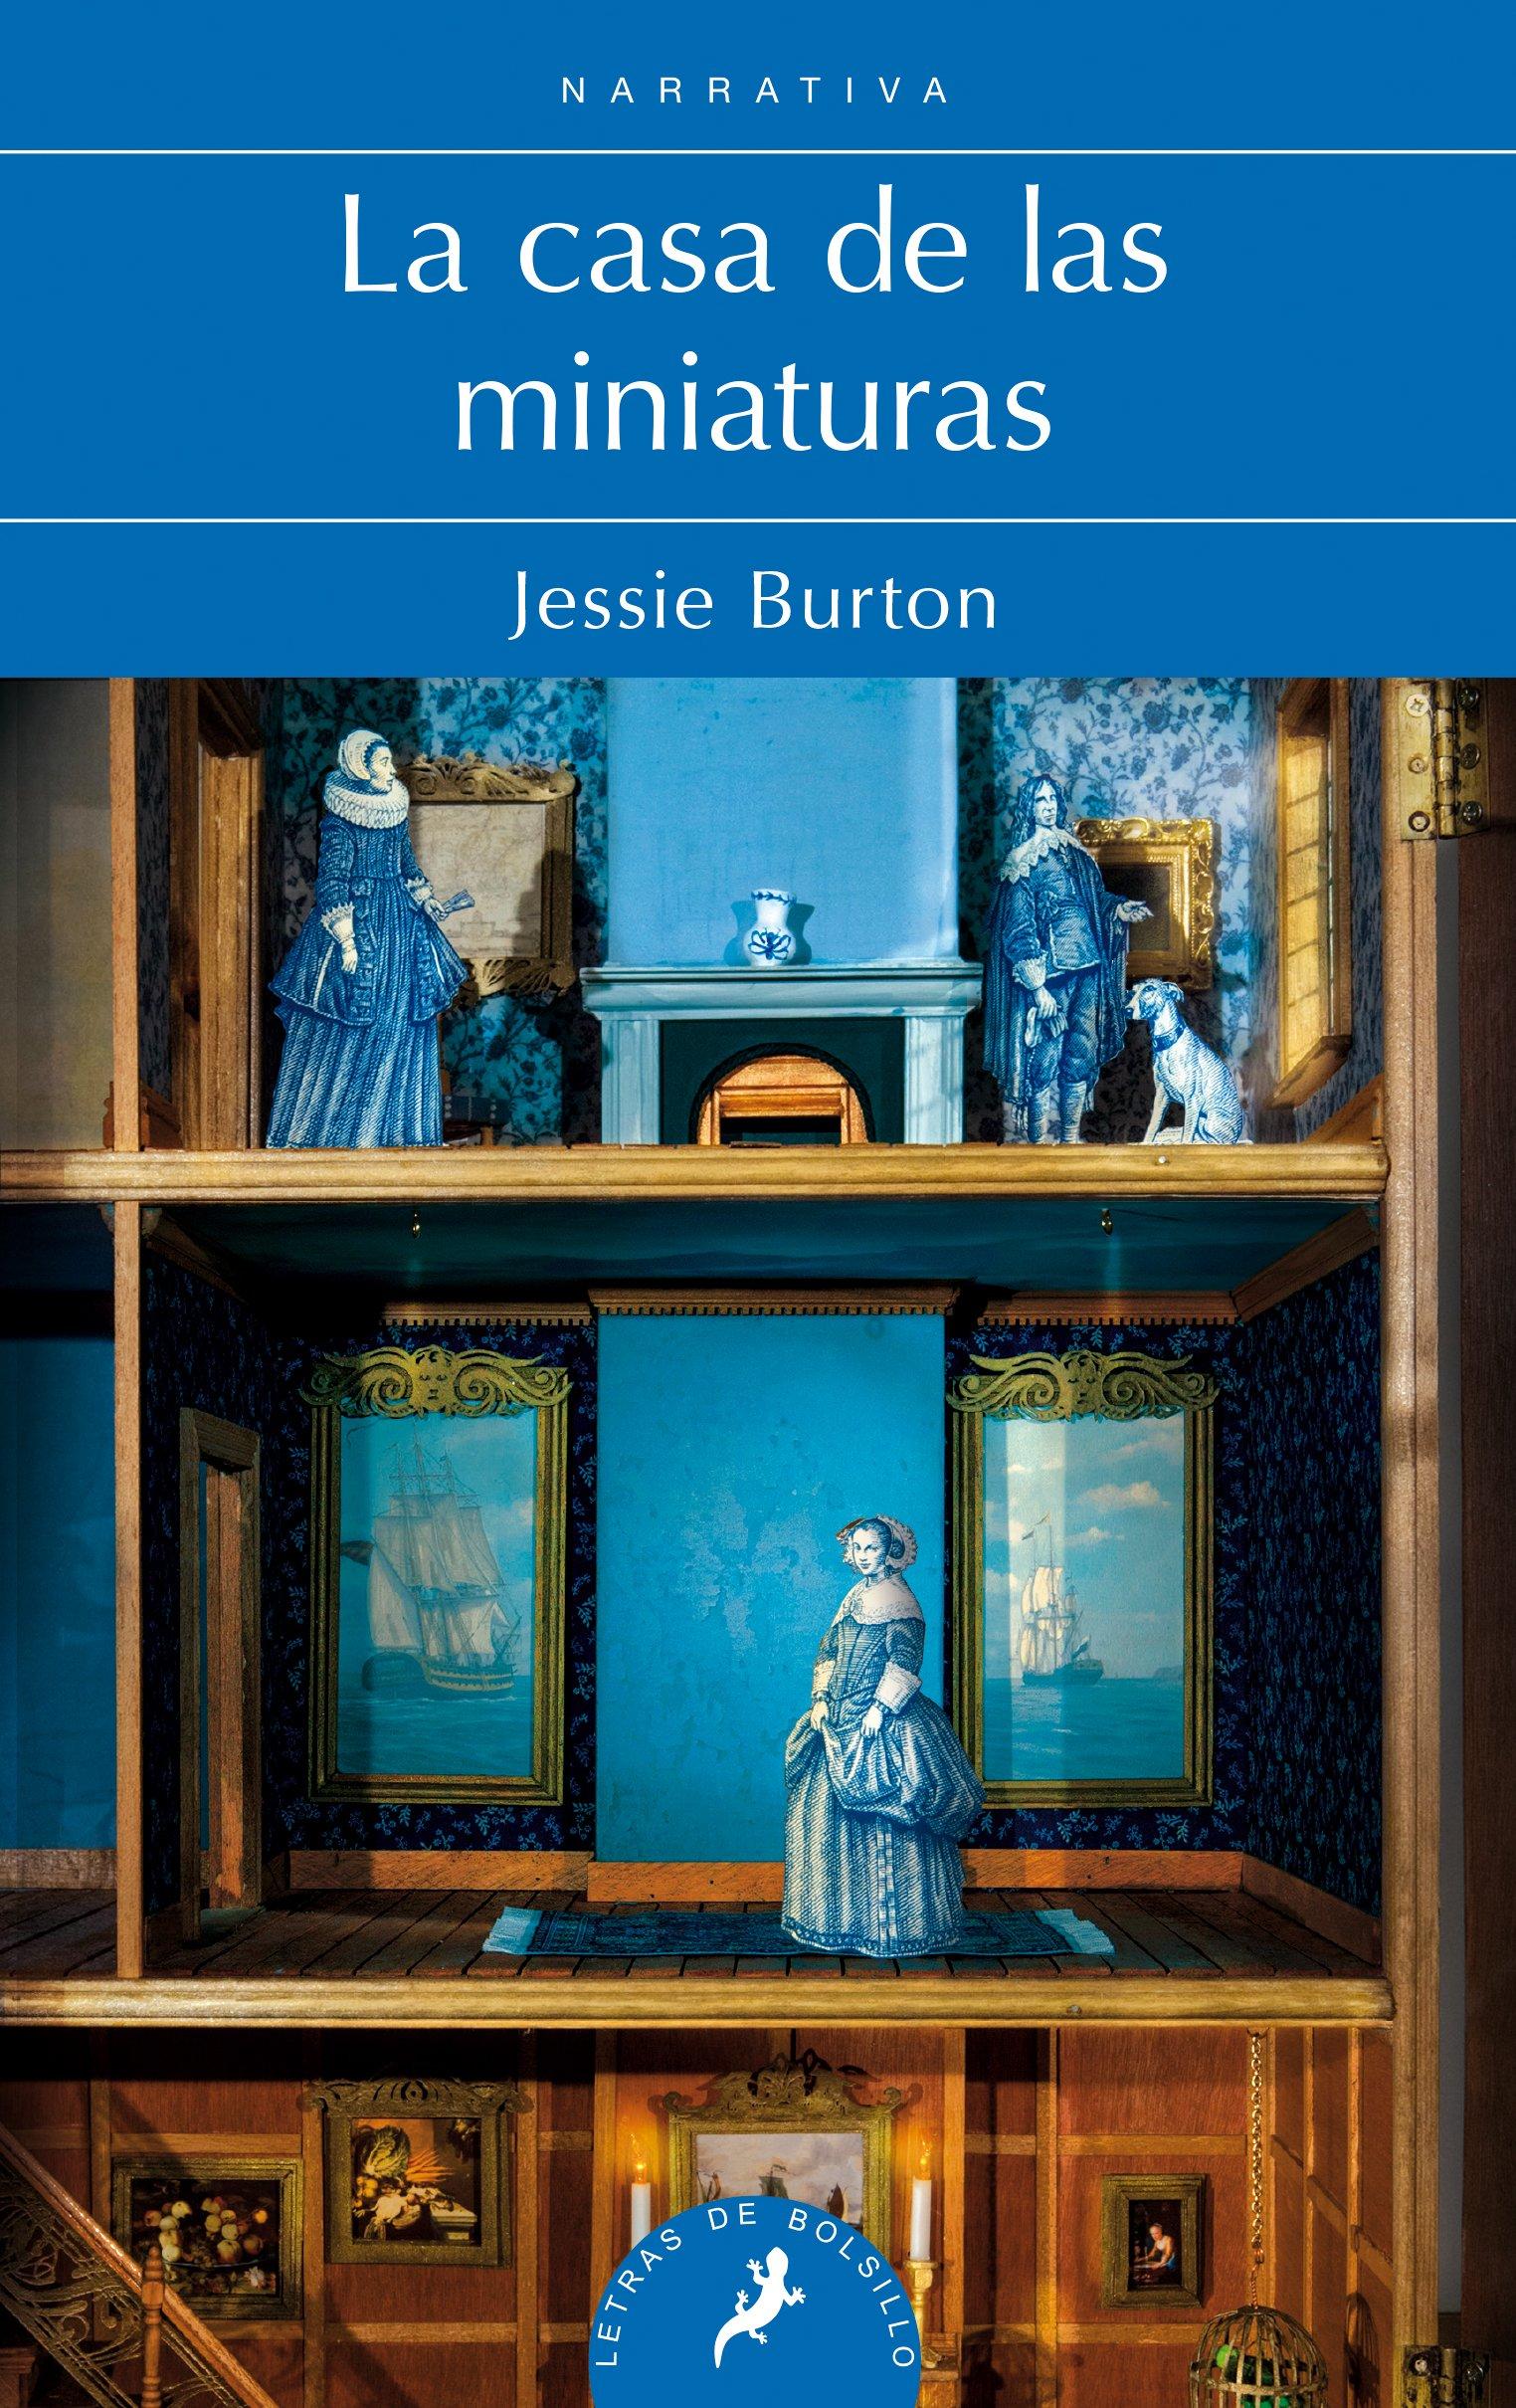 LA CASA DE LAS MINIATURAS -LB- S Letras de bolsillo  Amazon.es  Jessie  Burton  Libros ba85960578b